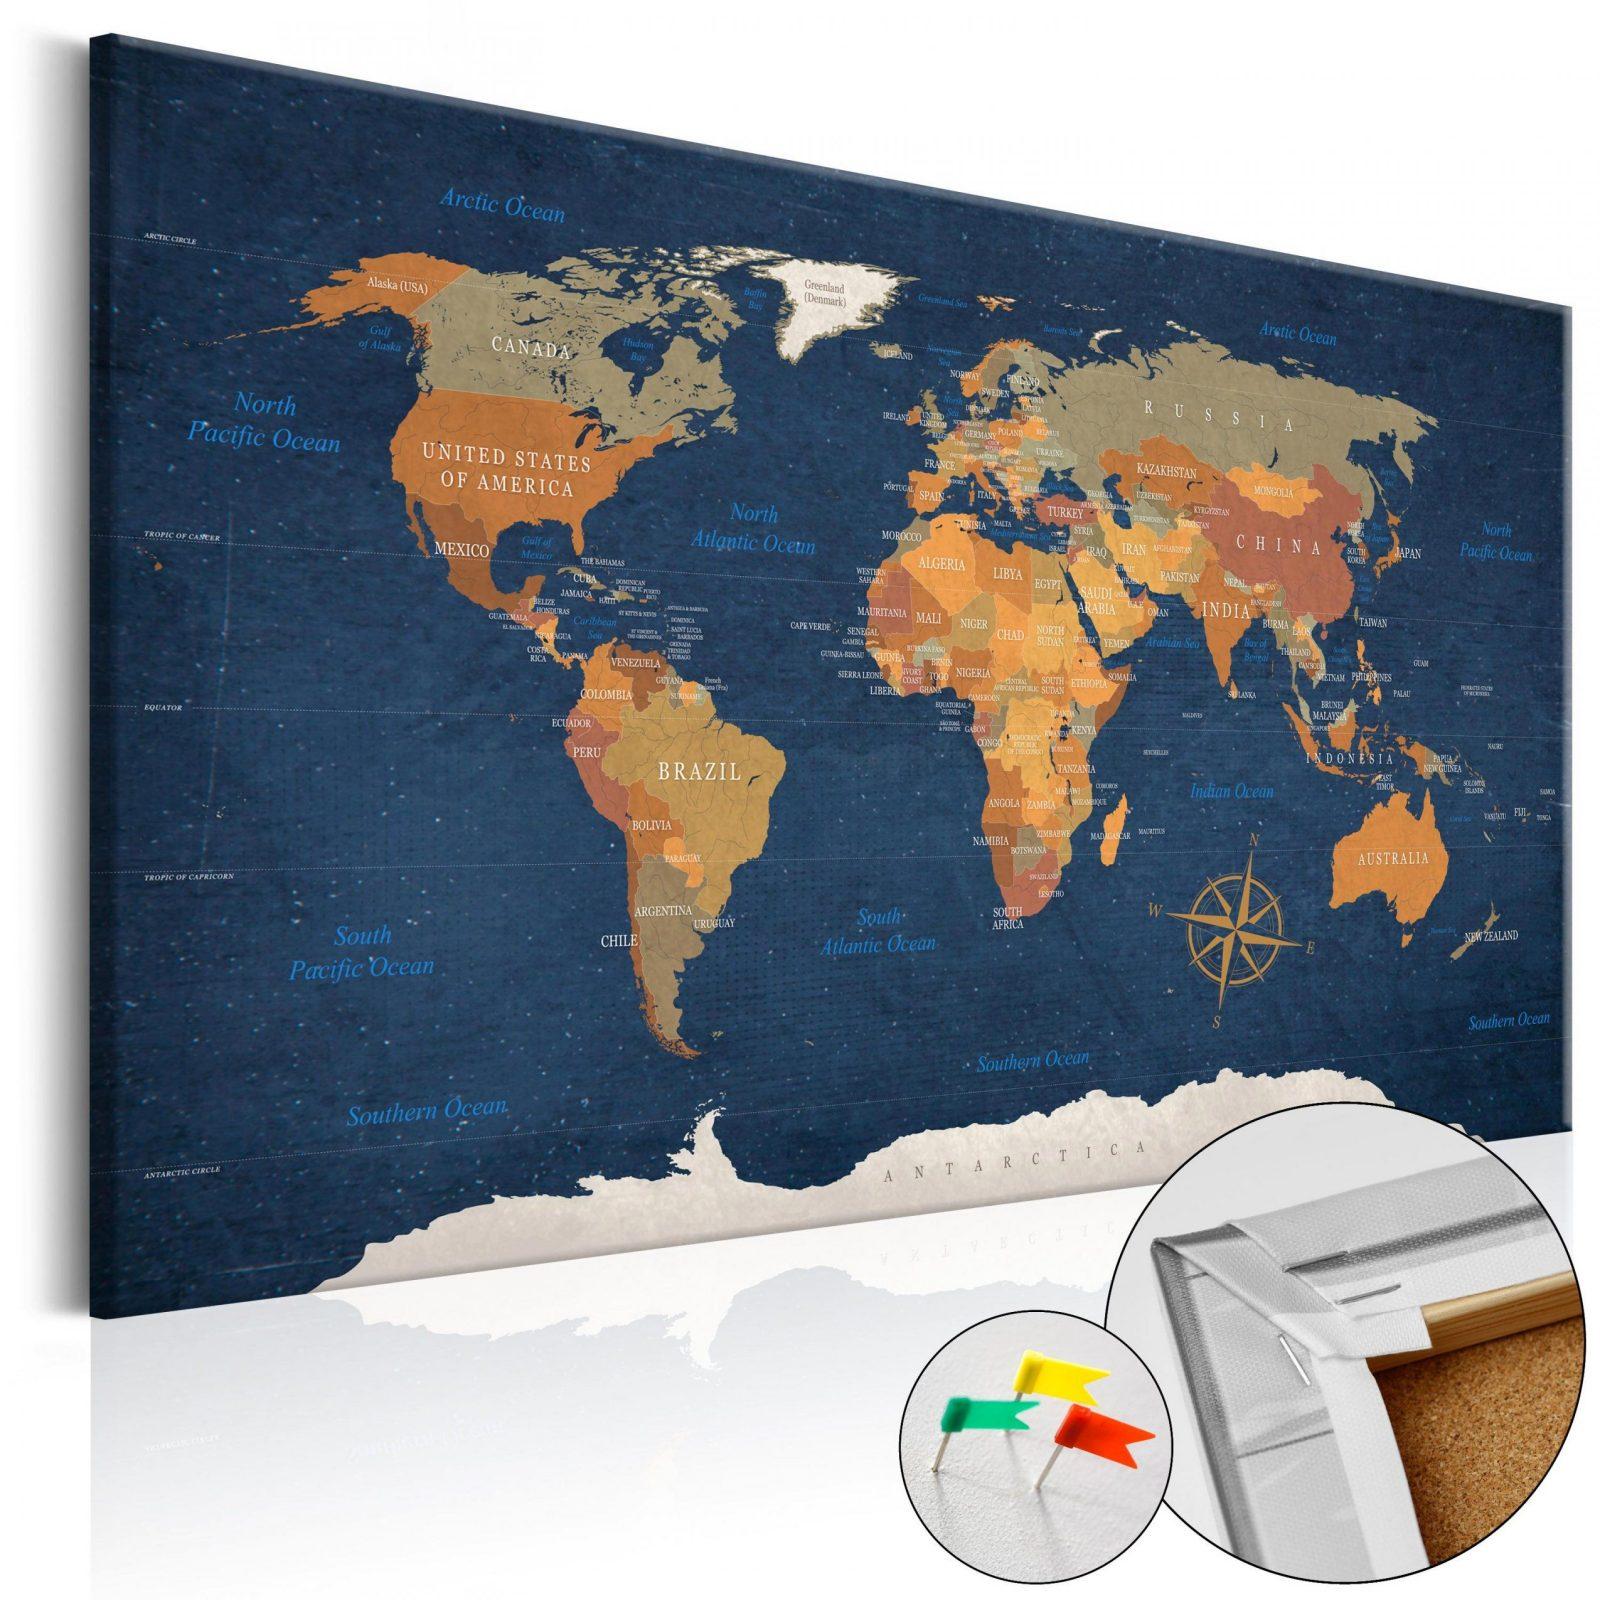 Kork Pinnwand Weltkarte Wandbilder Landkarte Leinwand Bilder Xxl Kc von Weltkarte Kork Selber Machen Bild